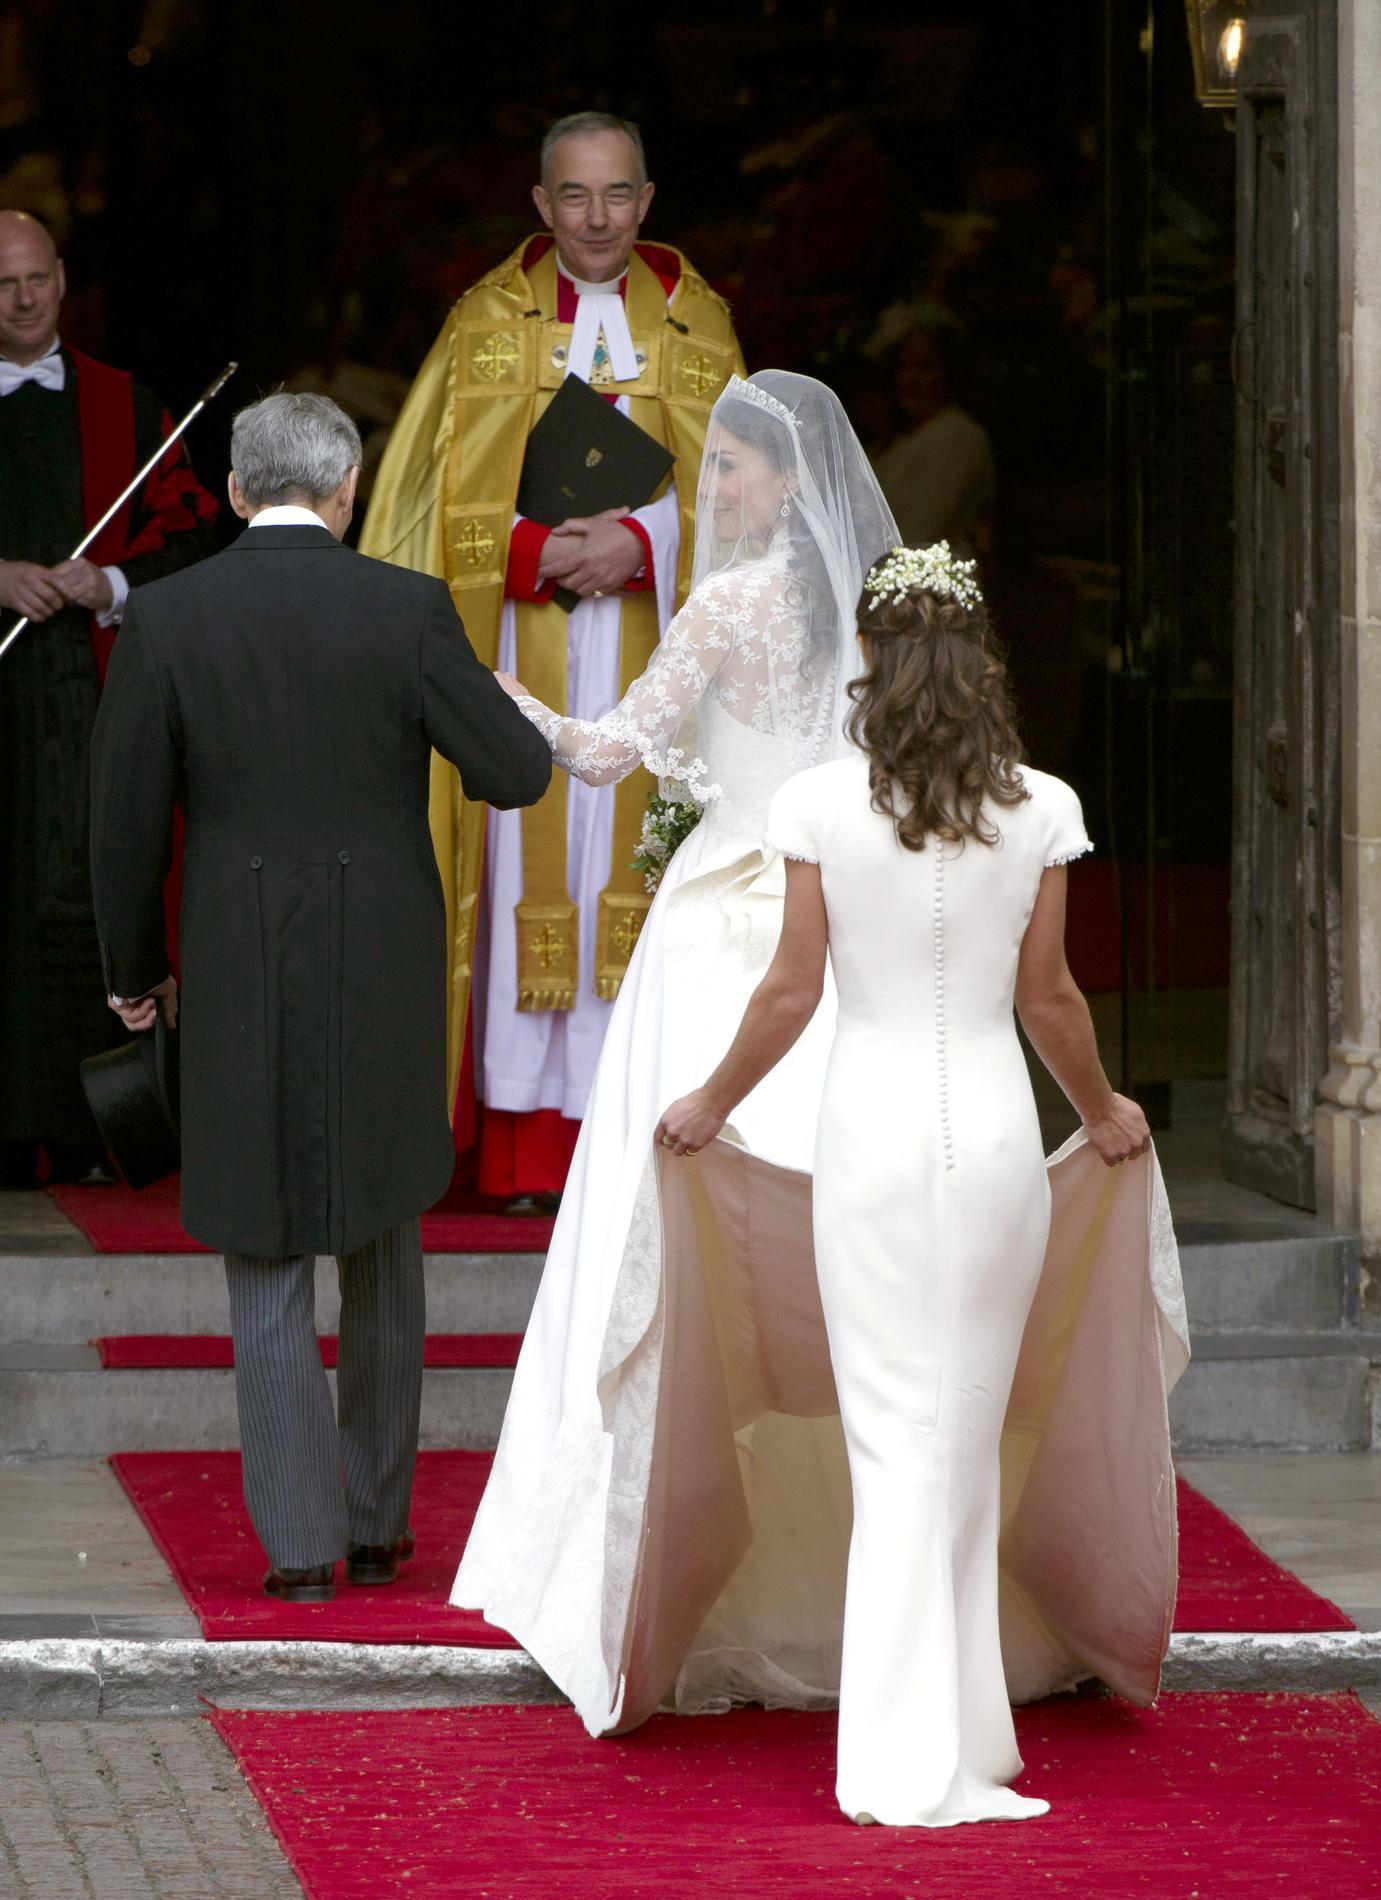 Robe de marie de kate middleton – Modèles